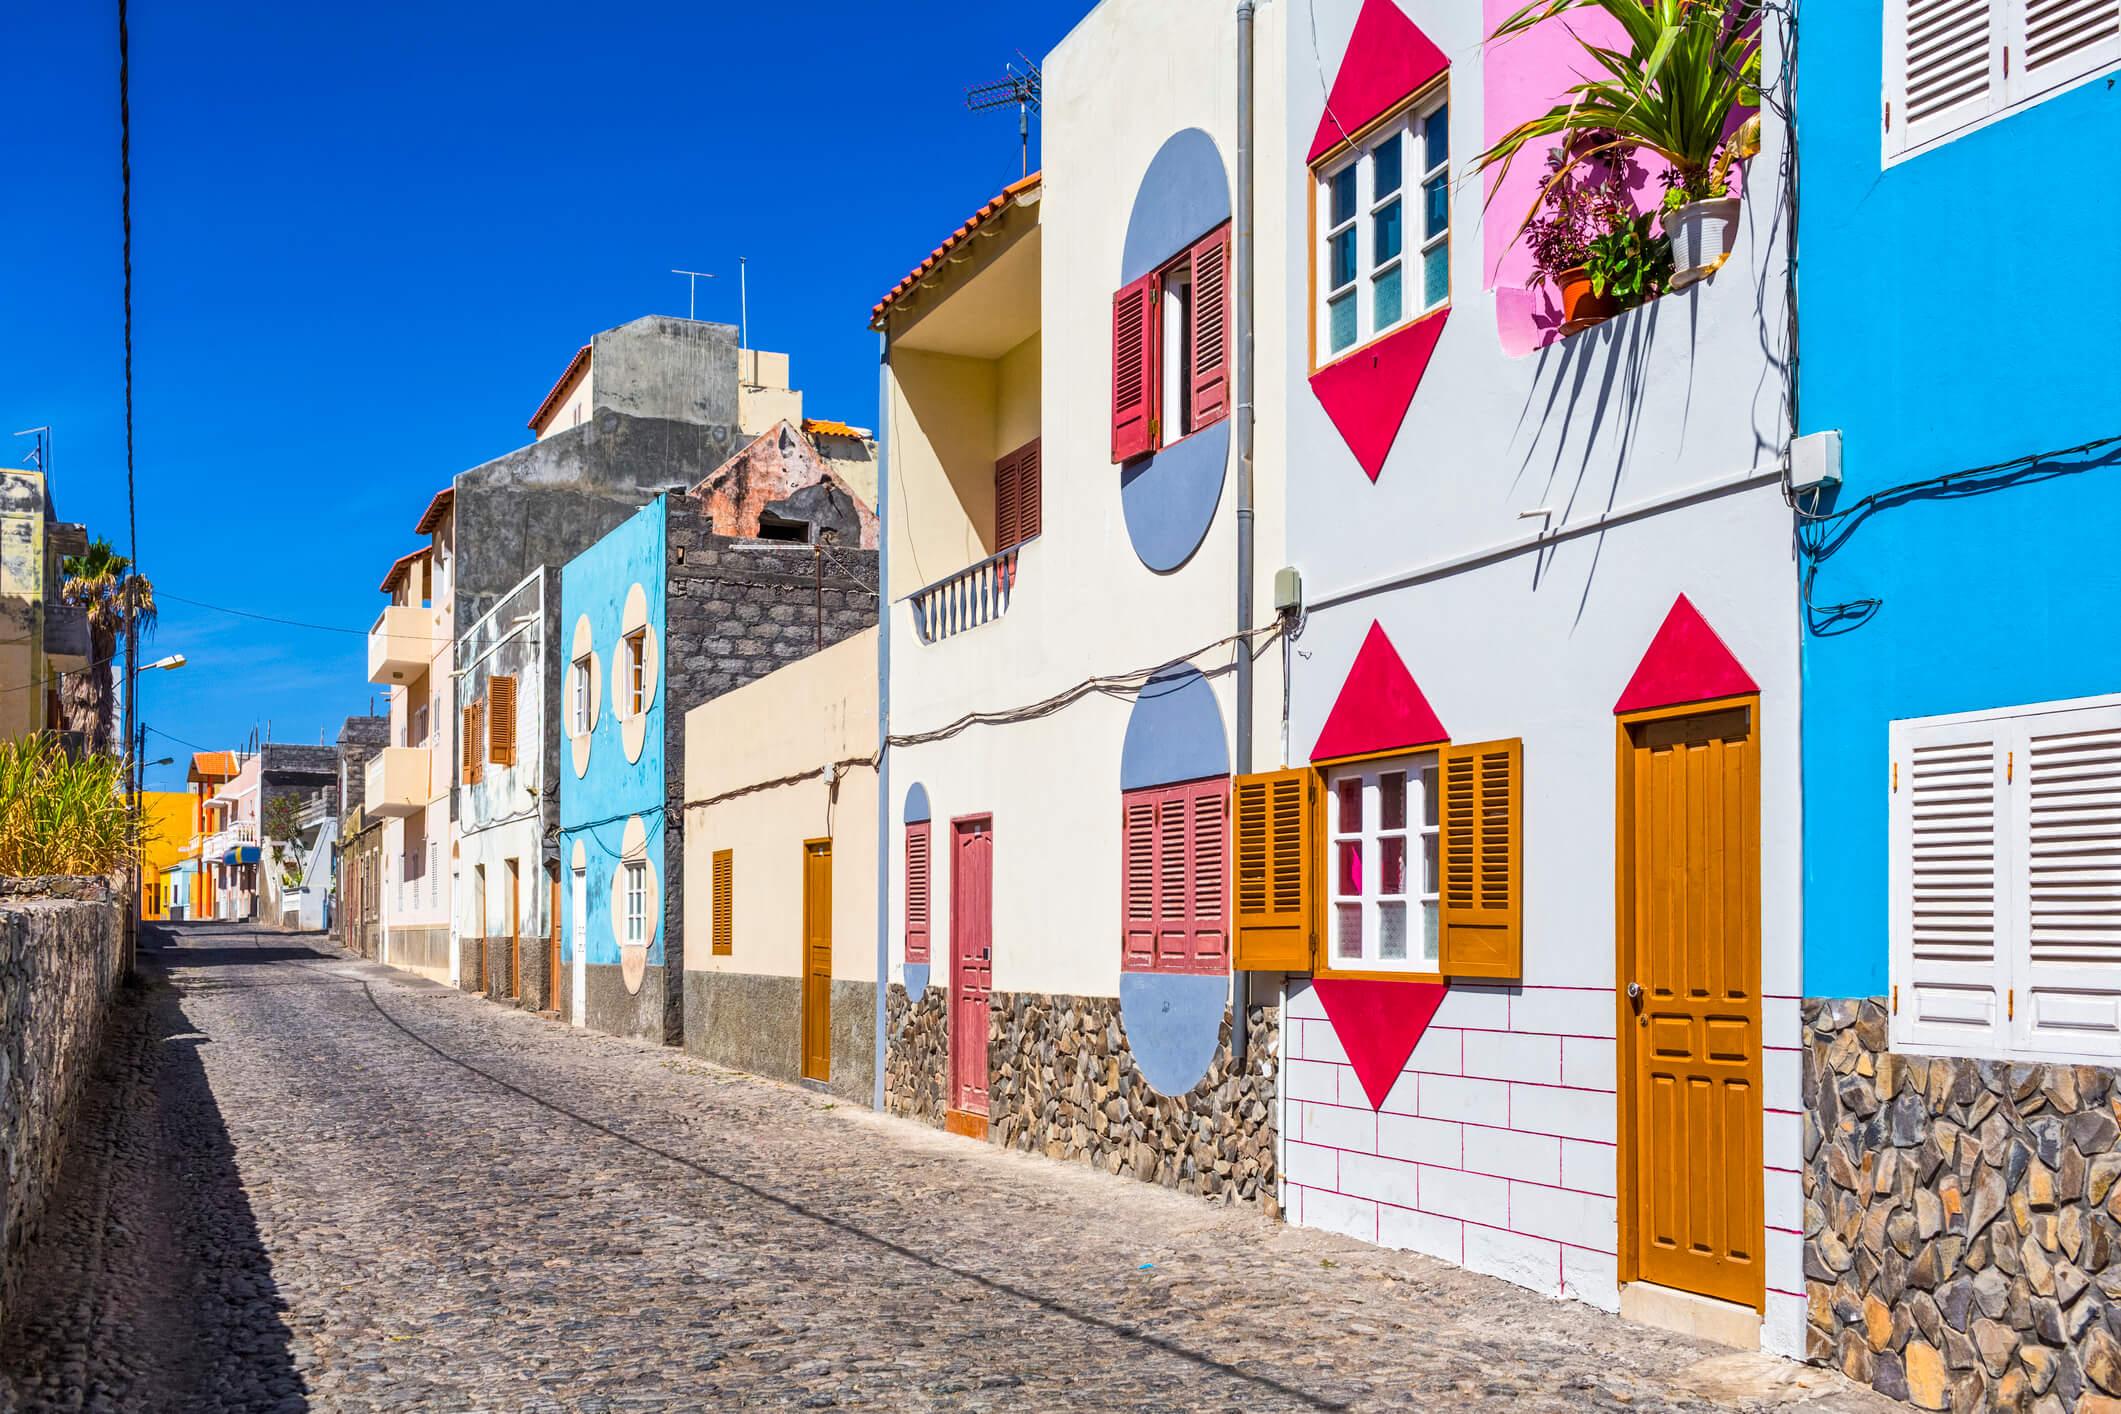 Häuserzeile in Kap Verde